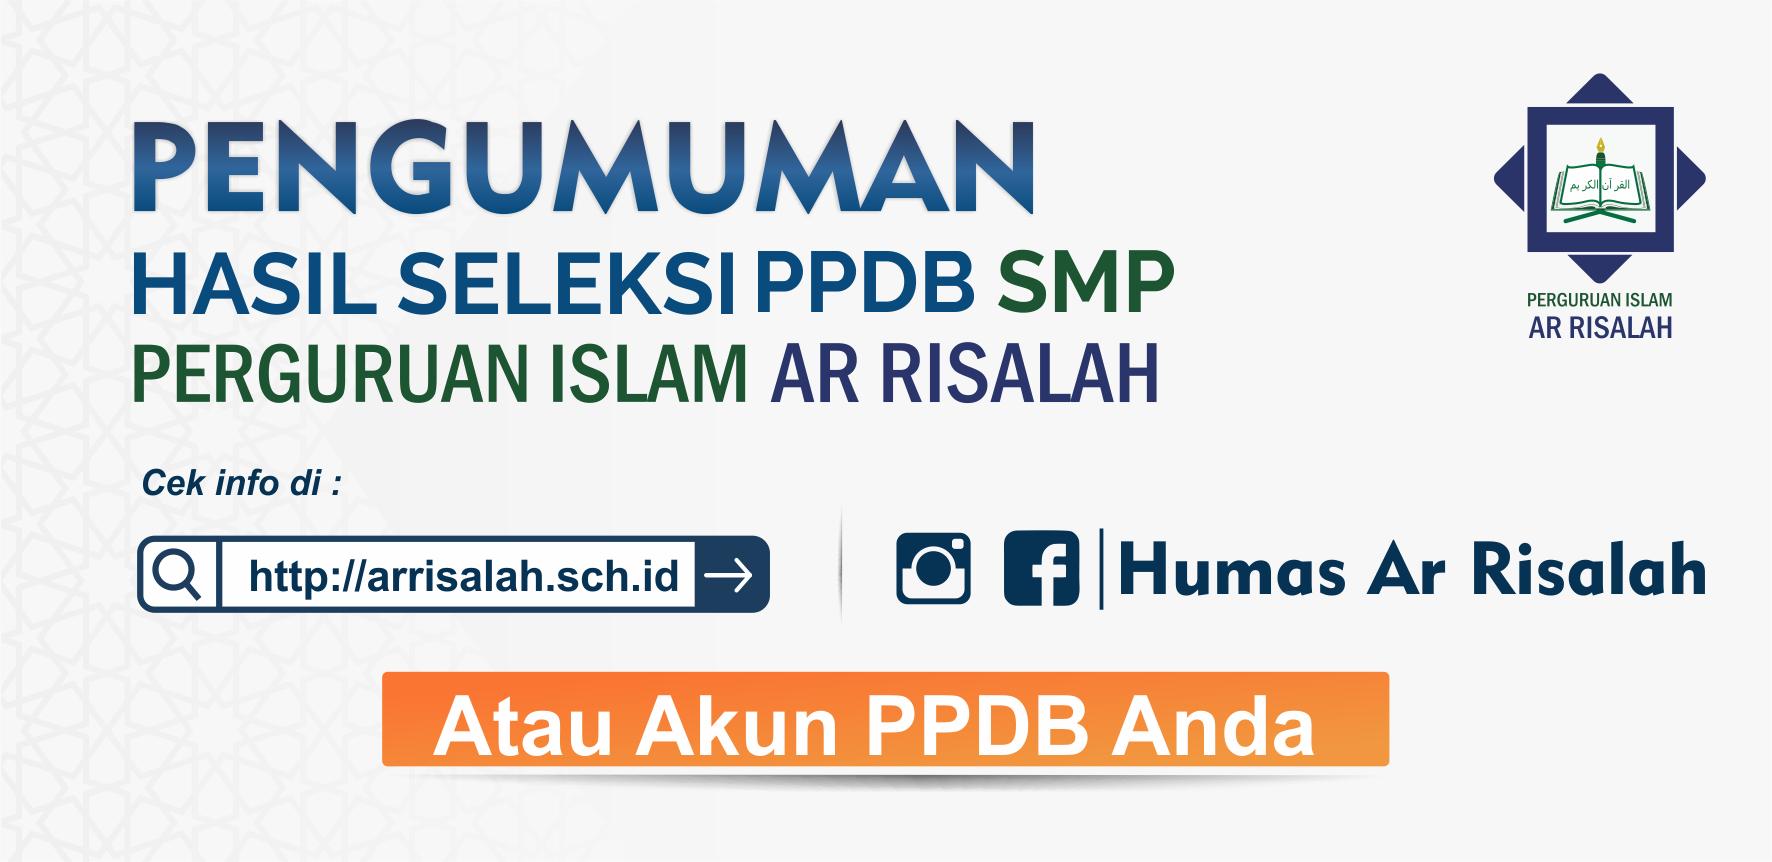 Pengumuman Hasil Tes PPDB SMP Ar Risalah Tahun Ajaran 2020/2021